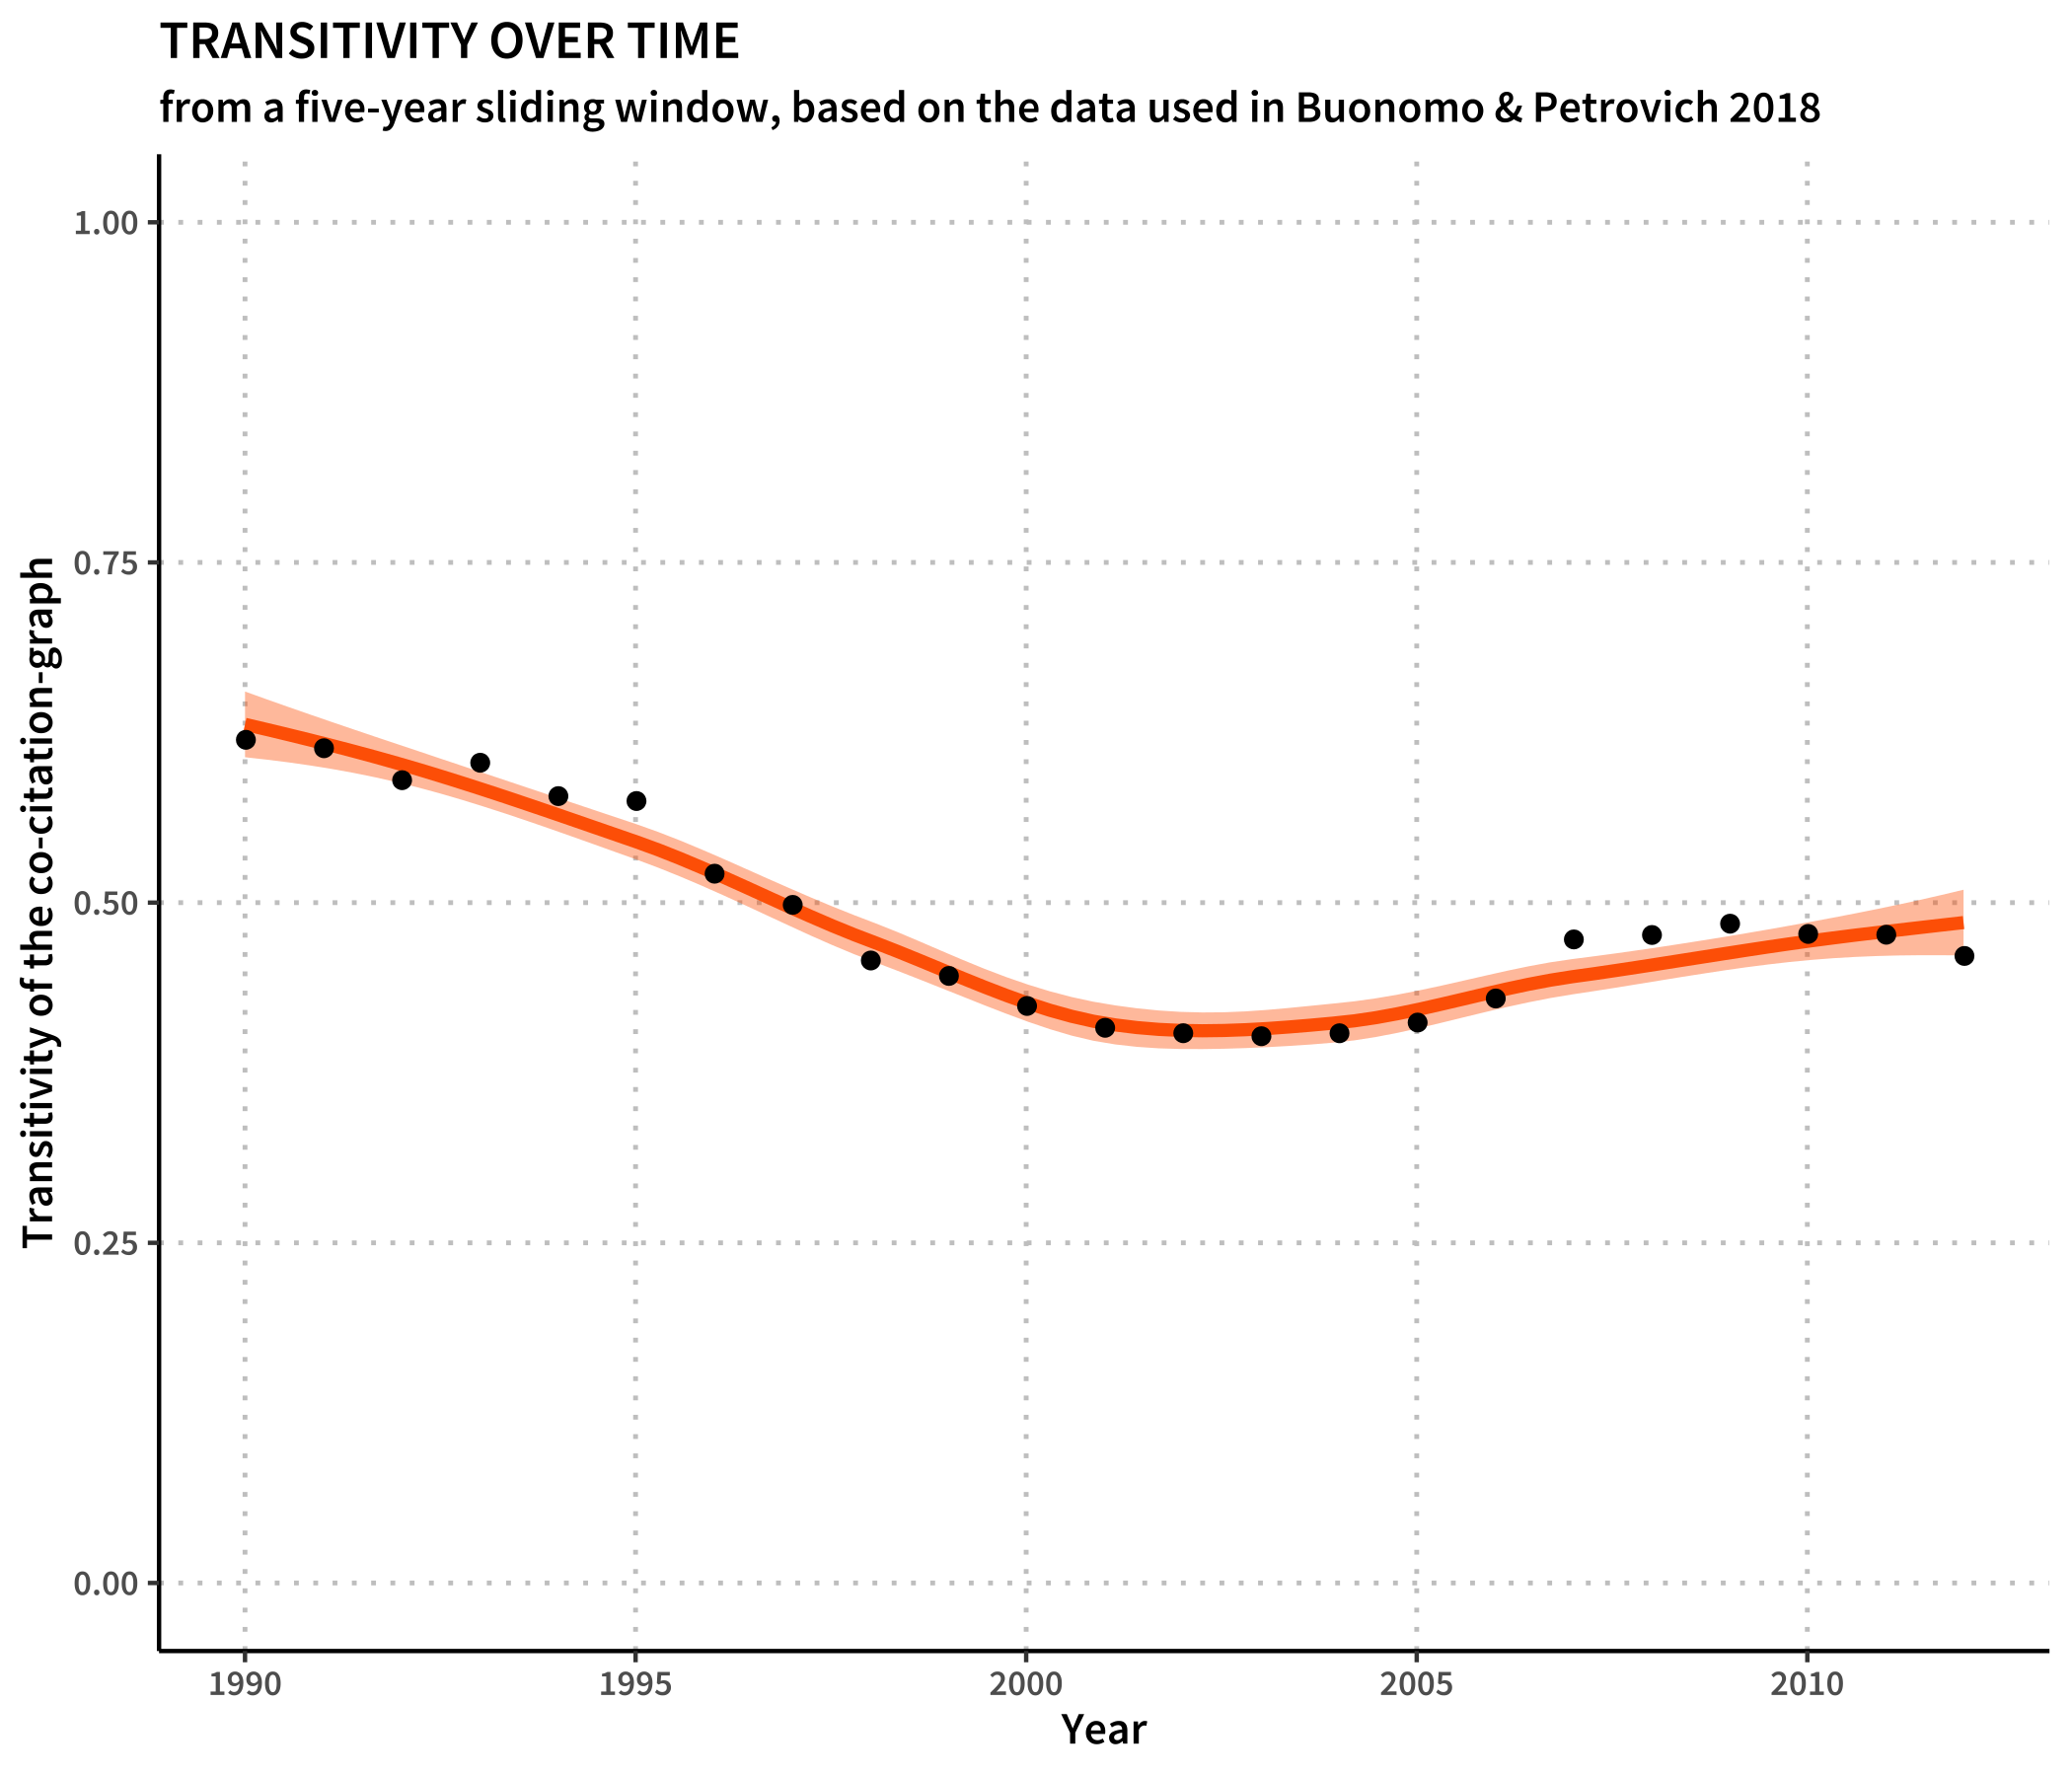 Transitivities